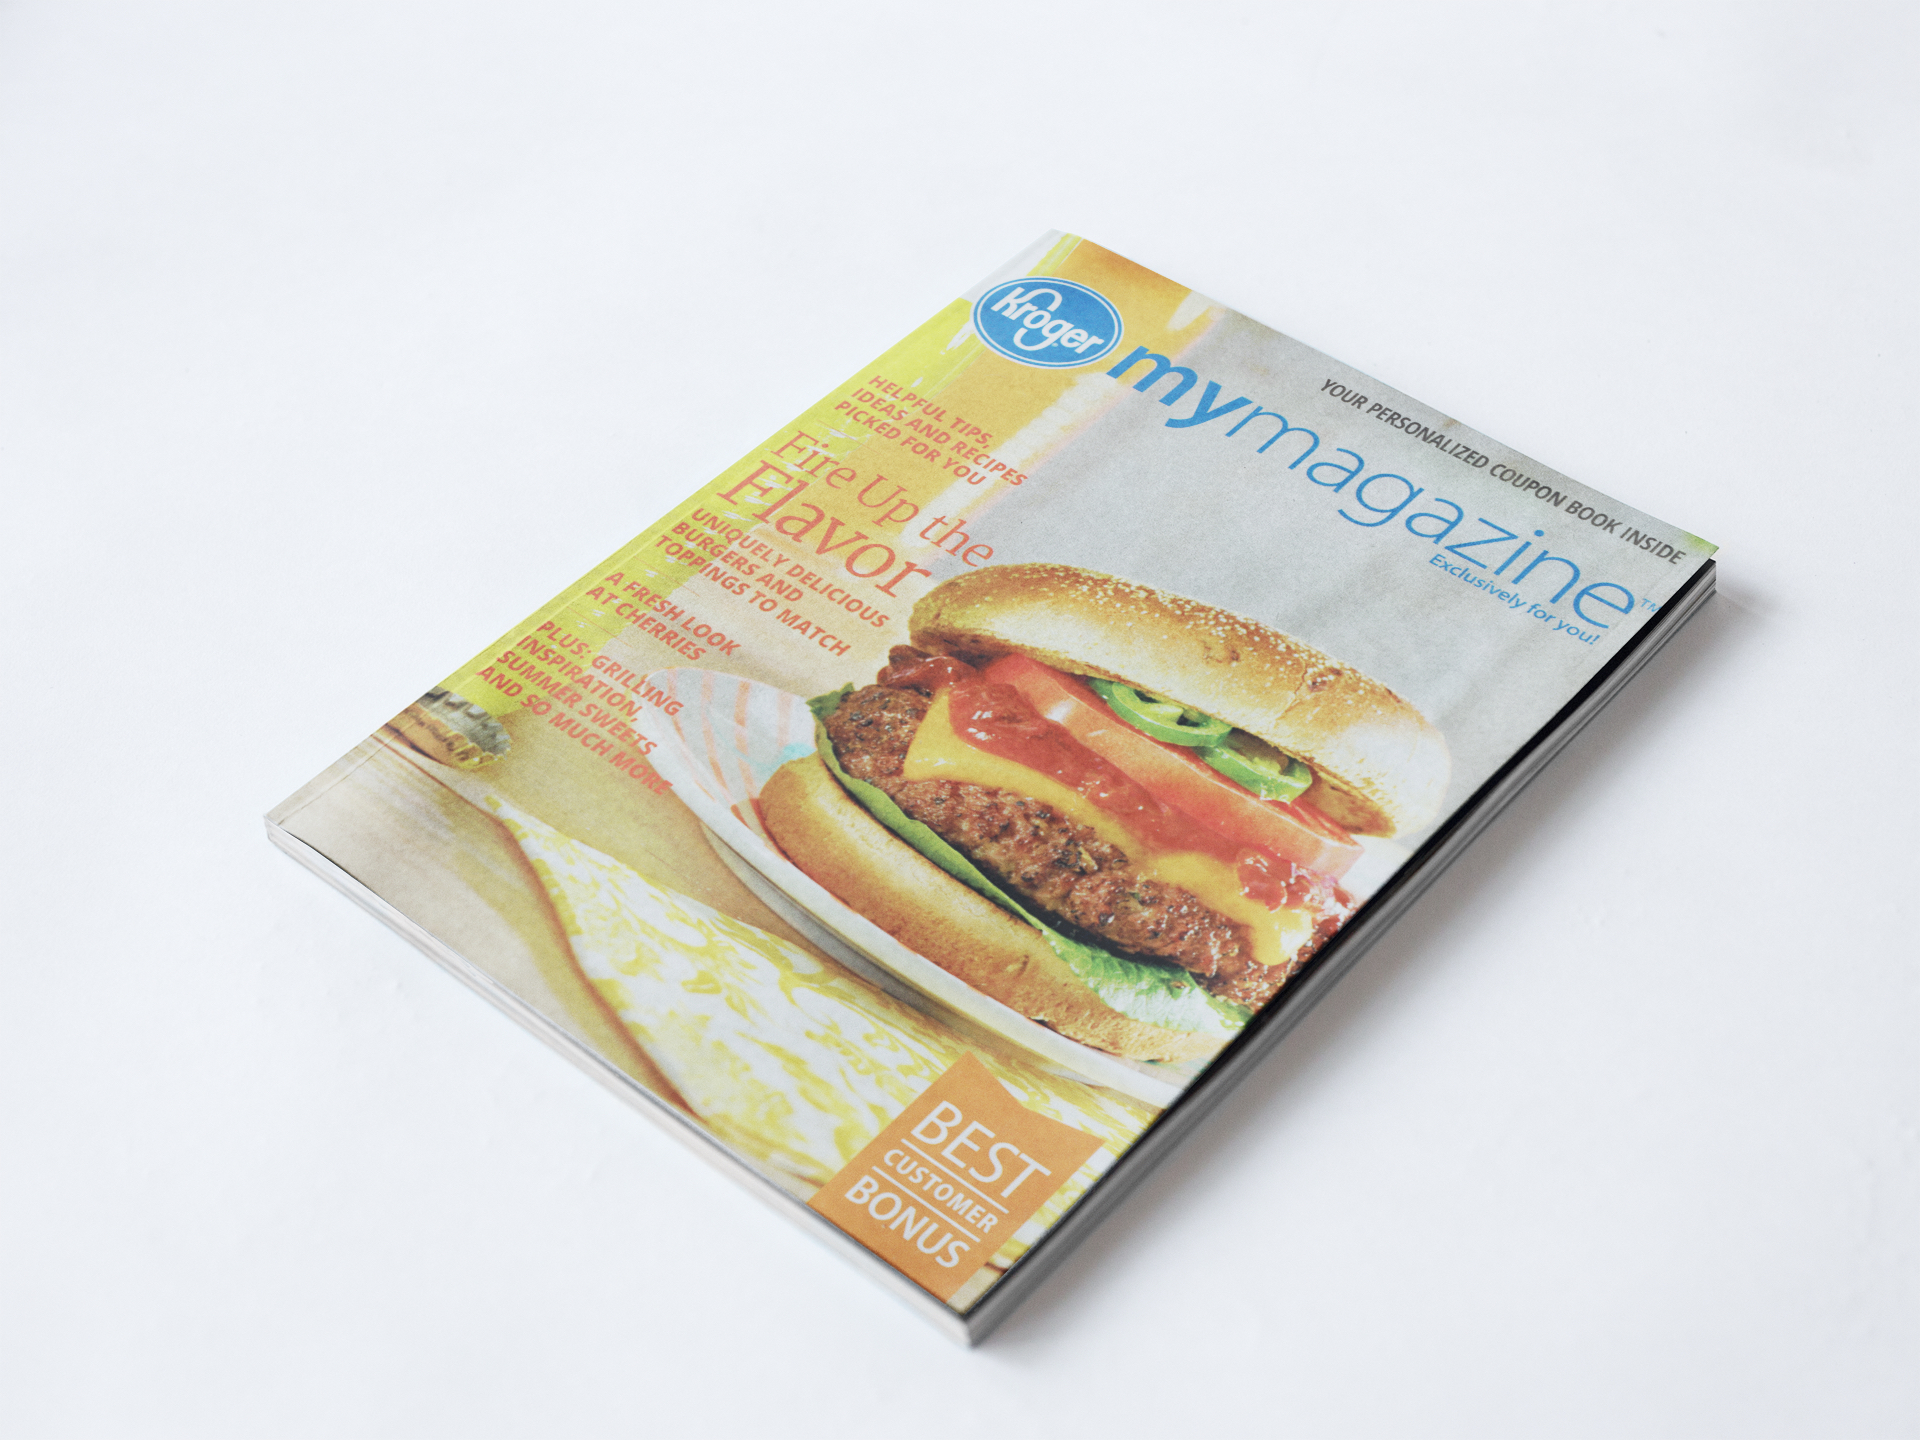 Kroger MyMagazine